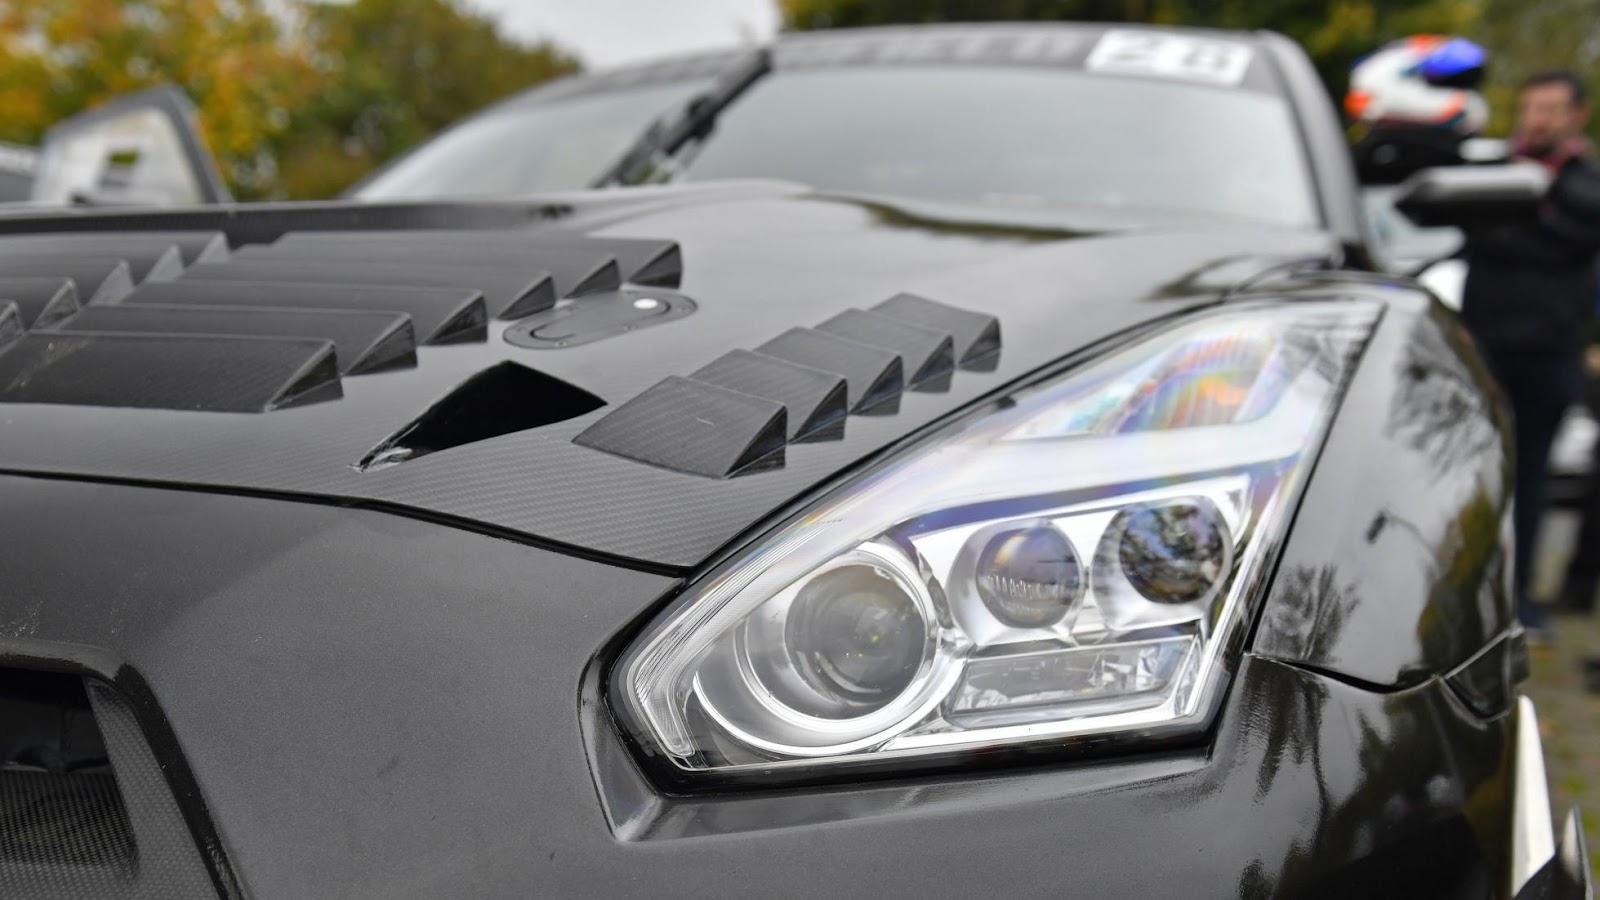 Litchfield-Nissan-GT-R-Nurburgring-6